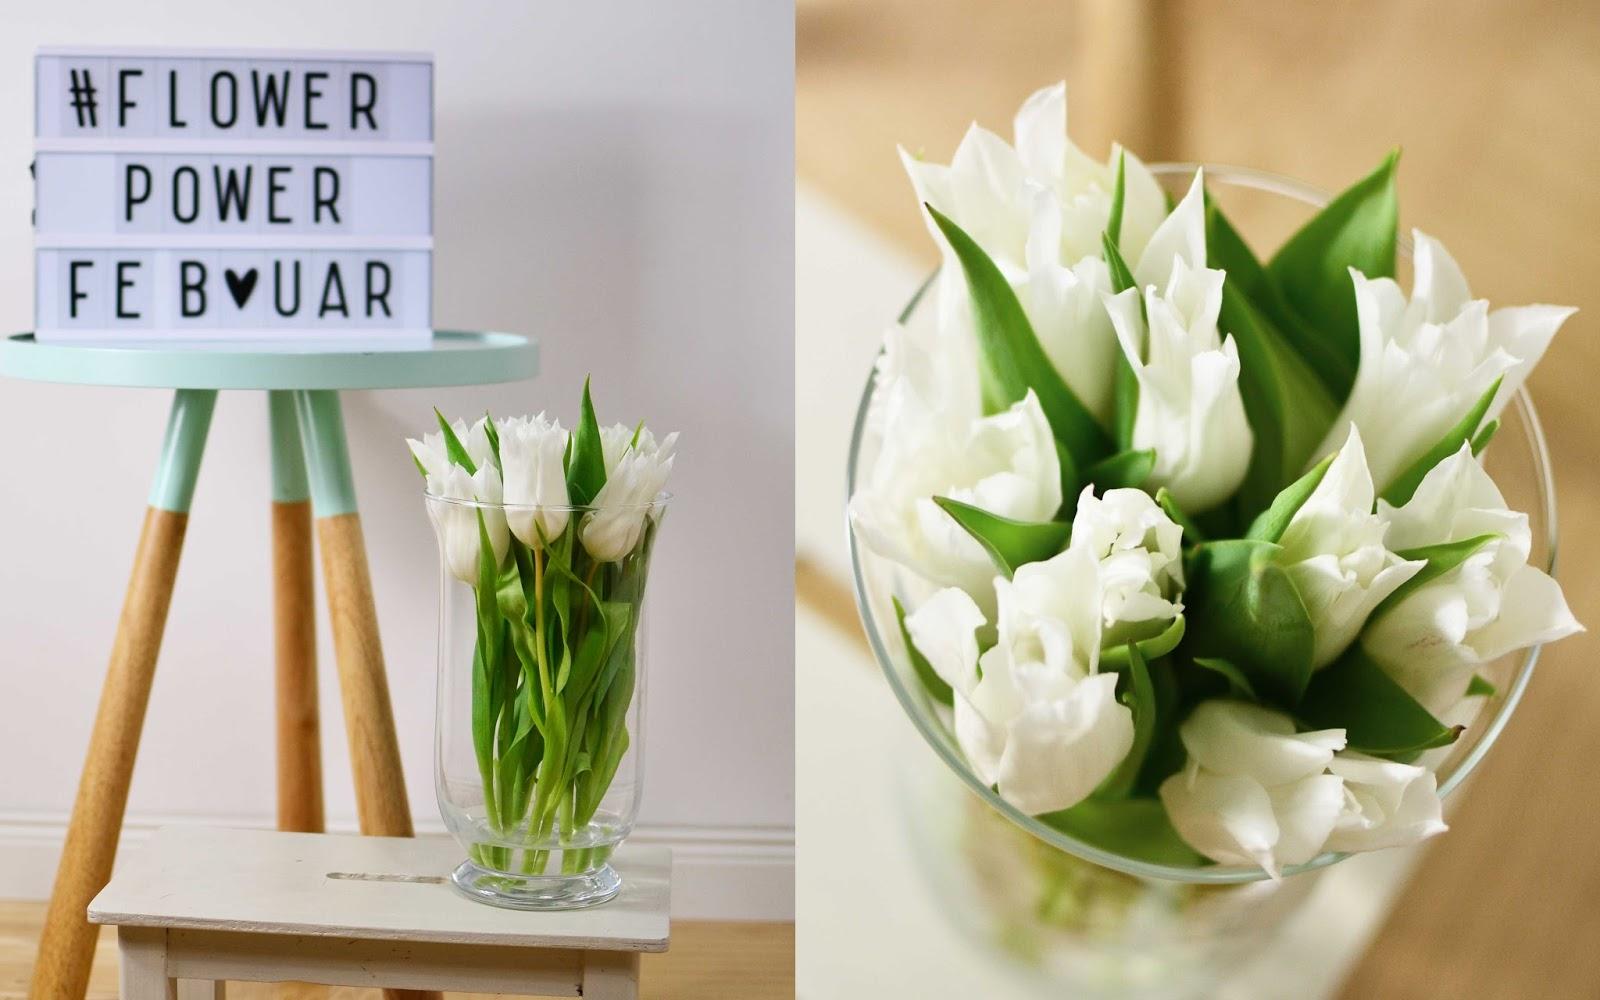 villa josefina flower power. Black Bedroom Furniture Sets. Home Design Ideas